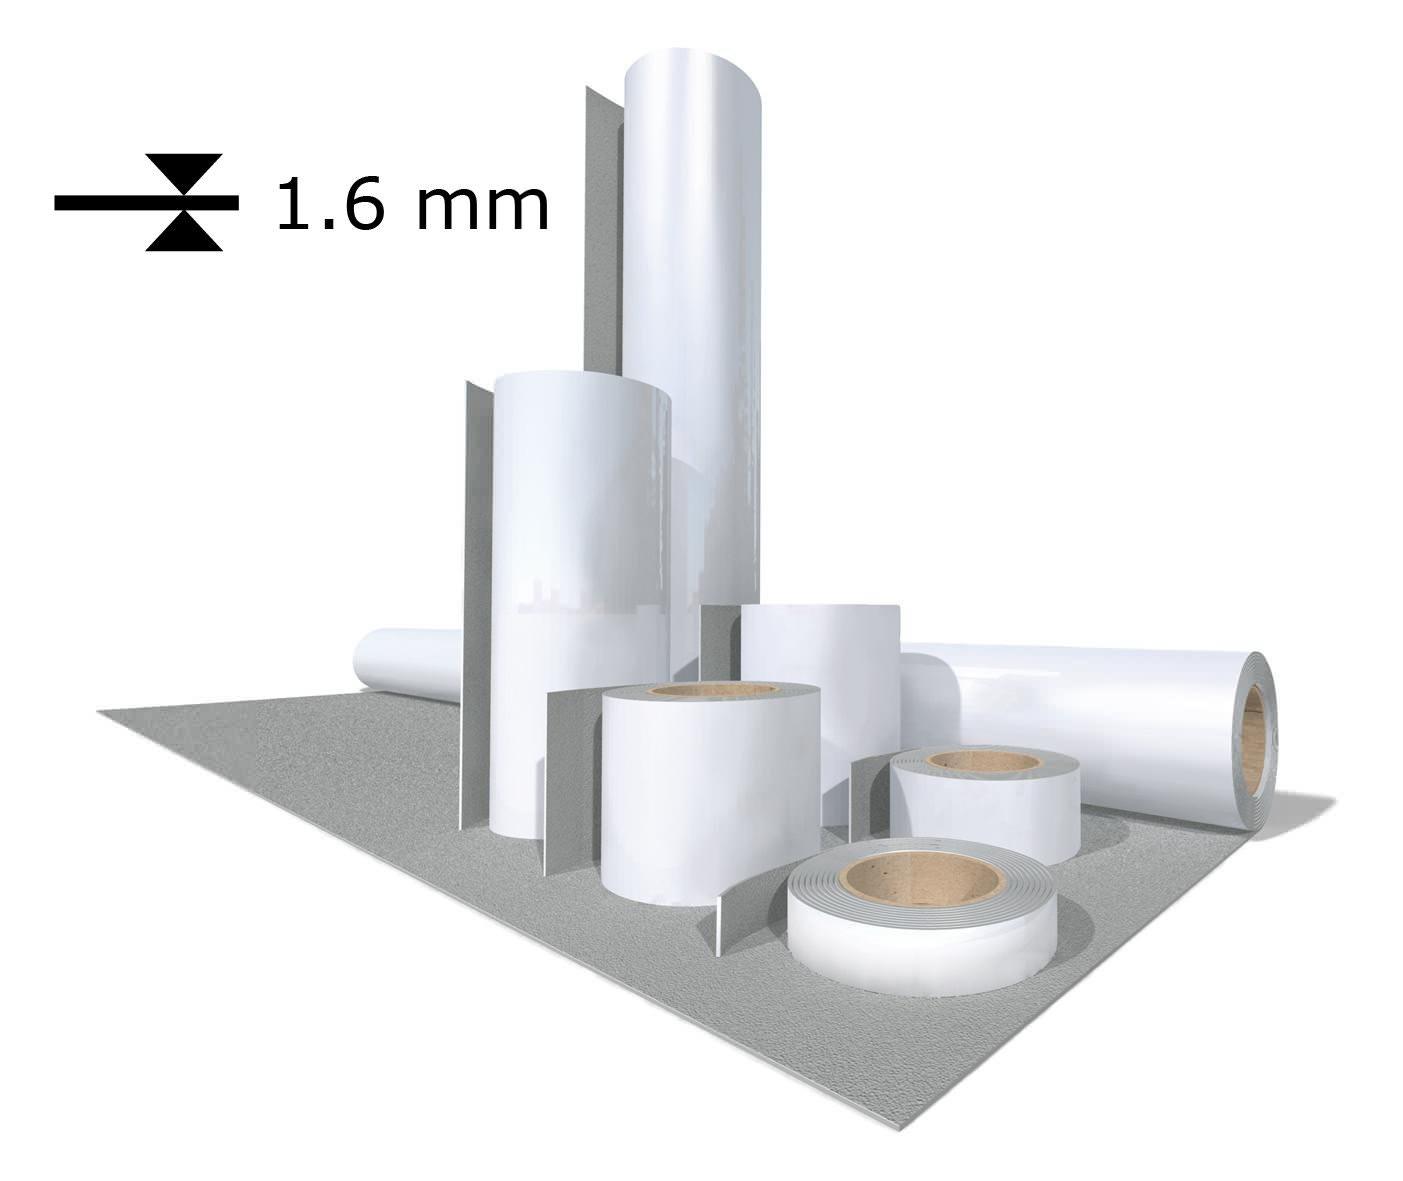 Rouleau antidérapant adhésif 1,6 mm